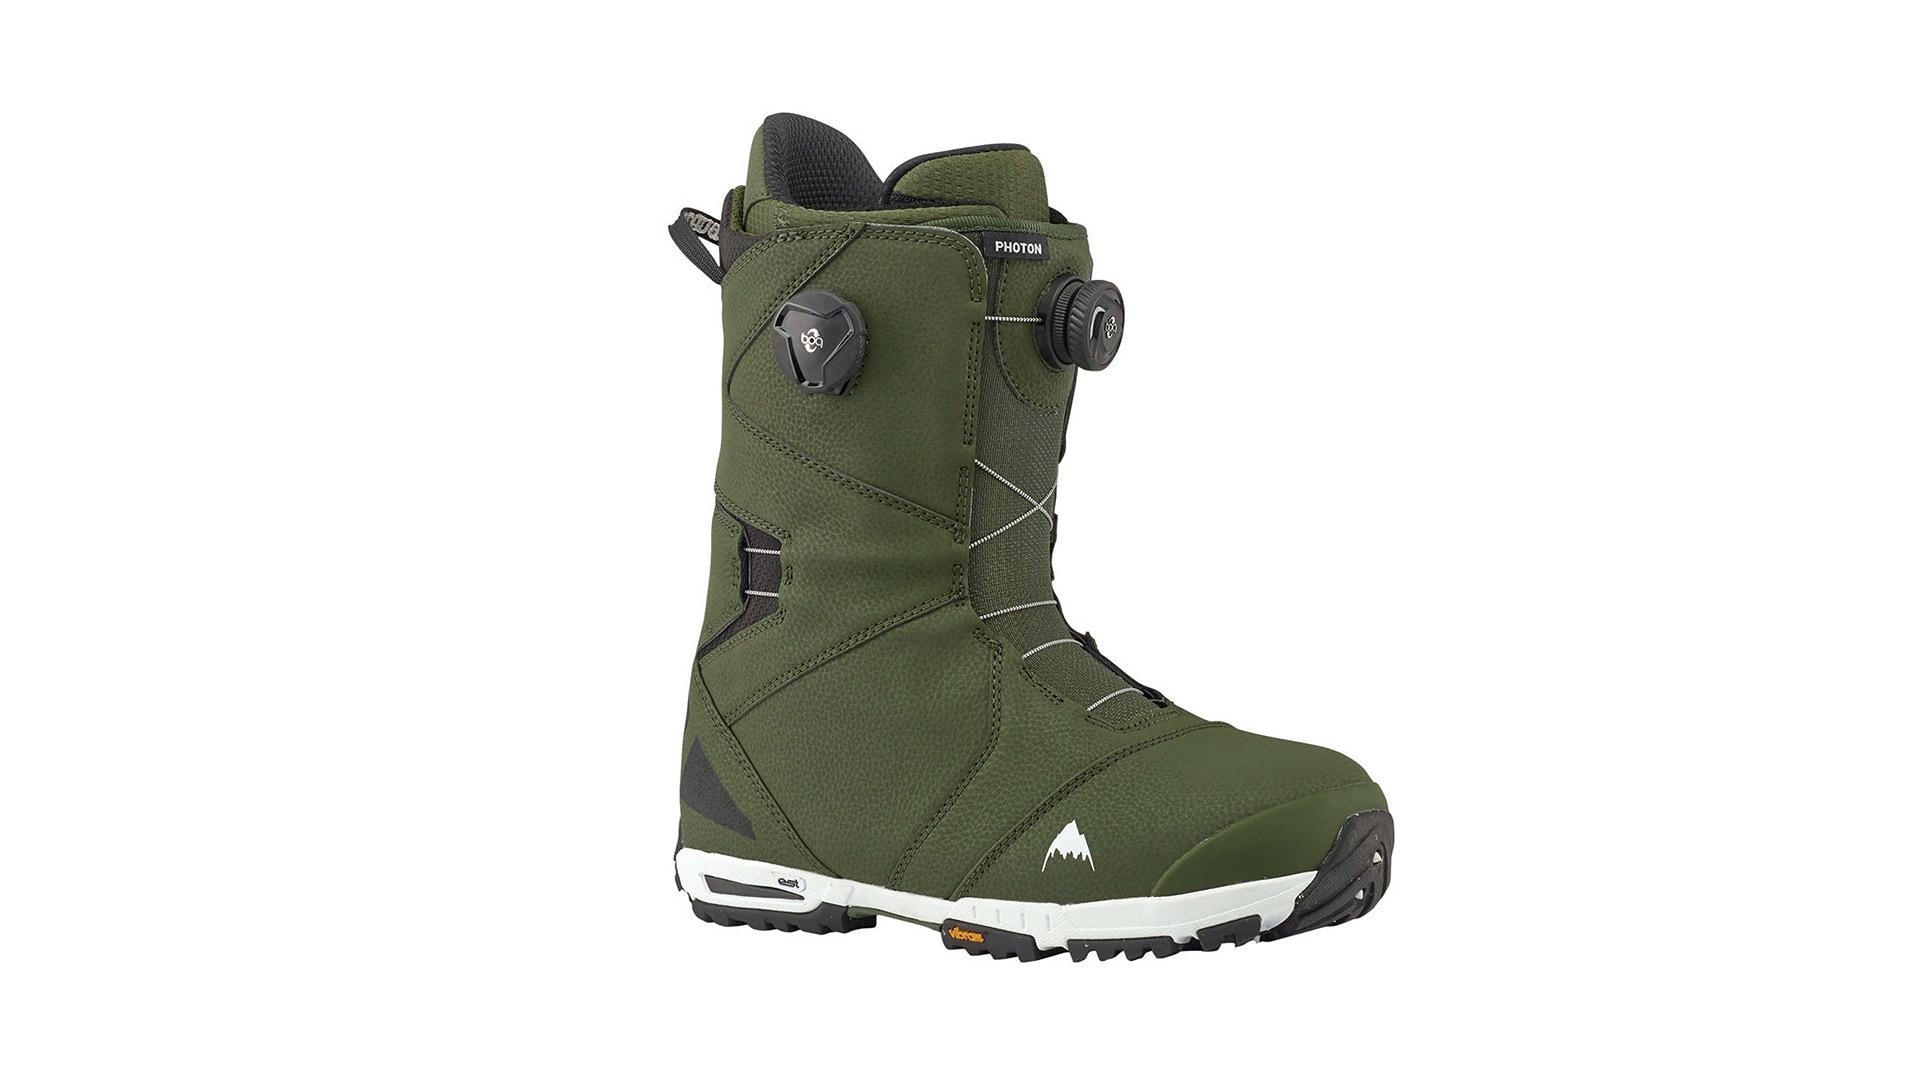 burton-photon-boots